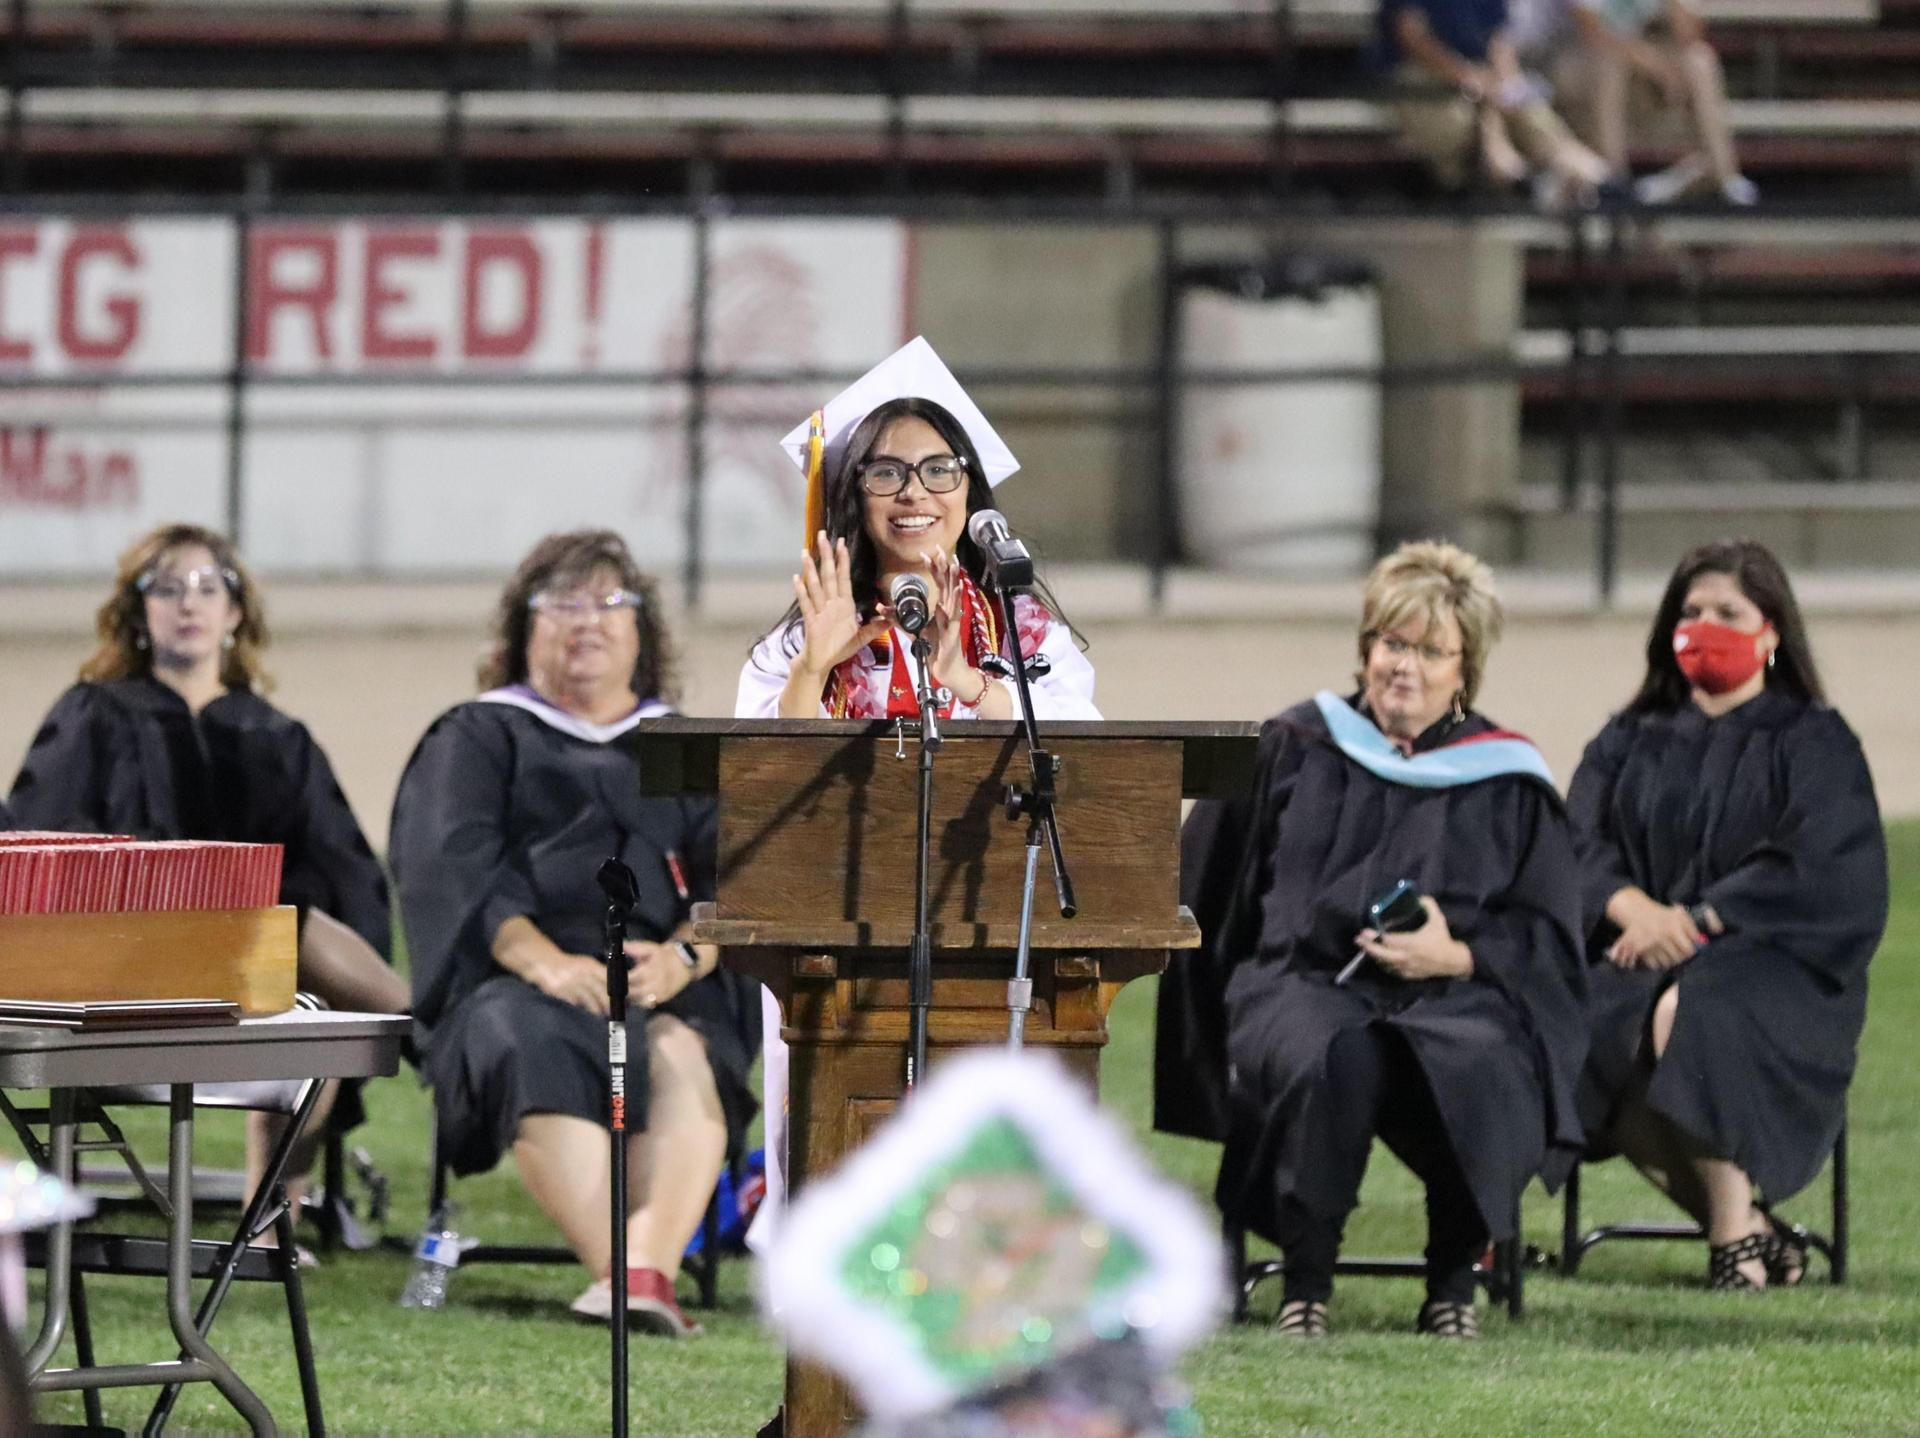 Valedictorian Jennifer Lugo